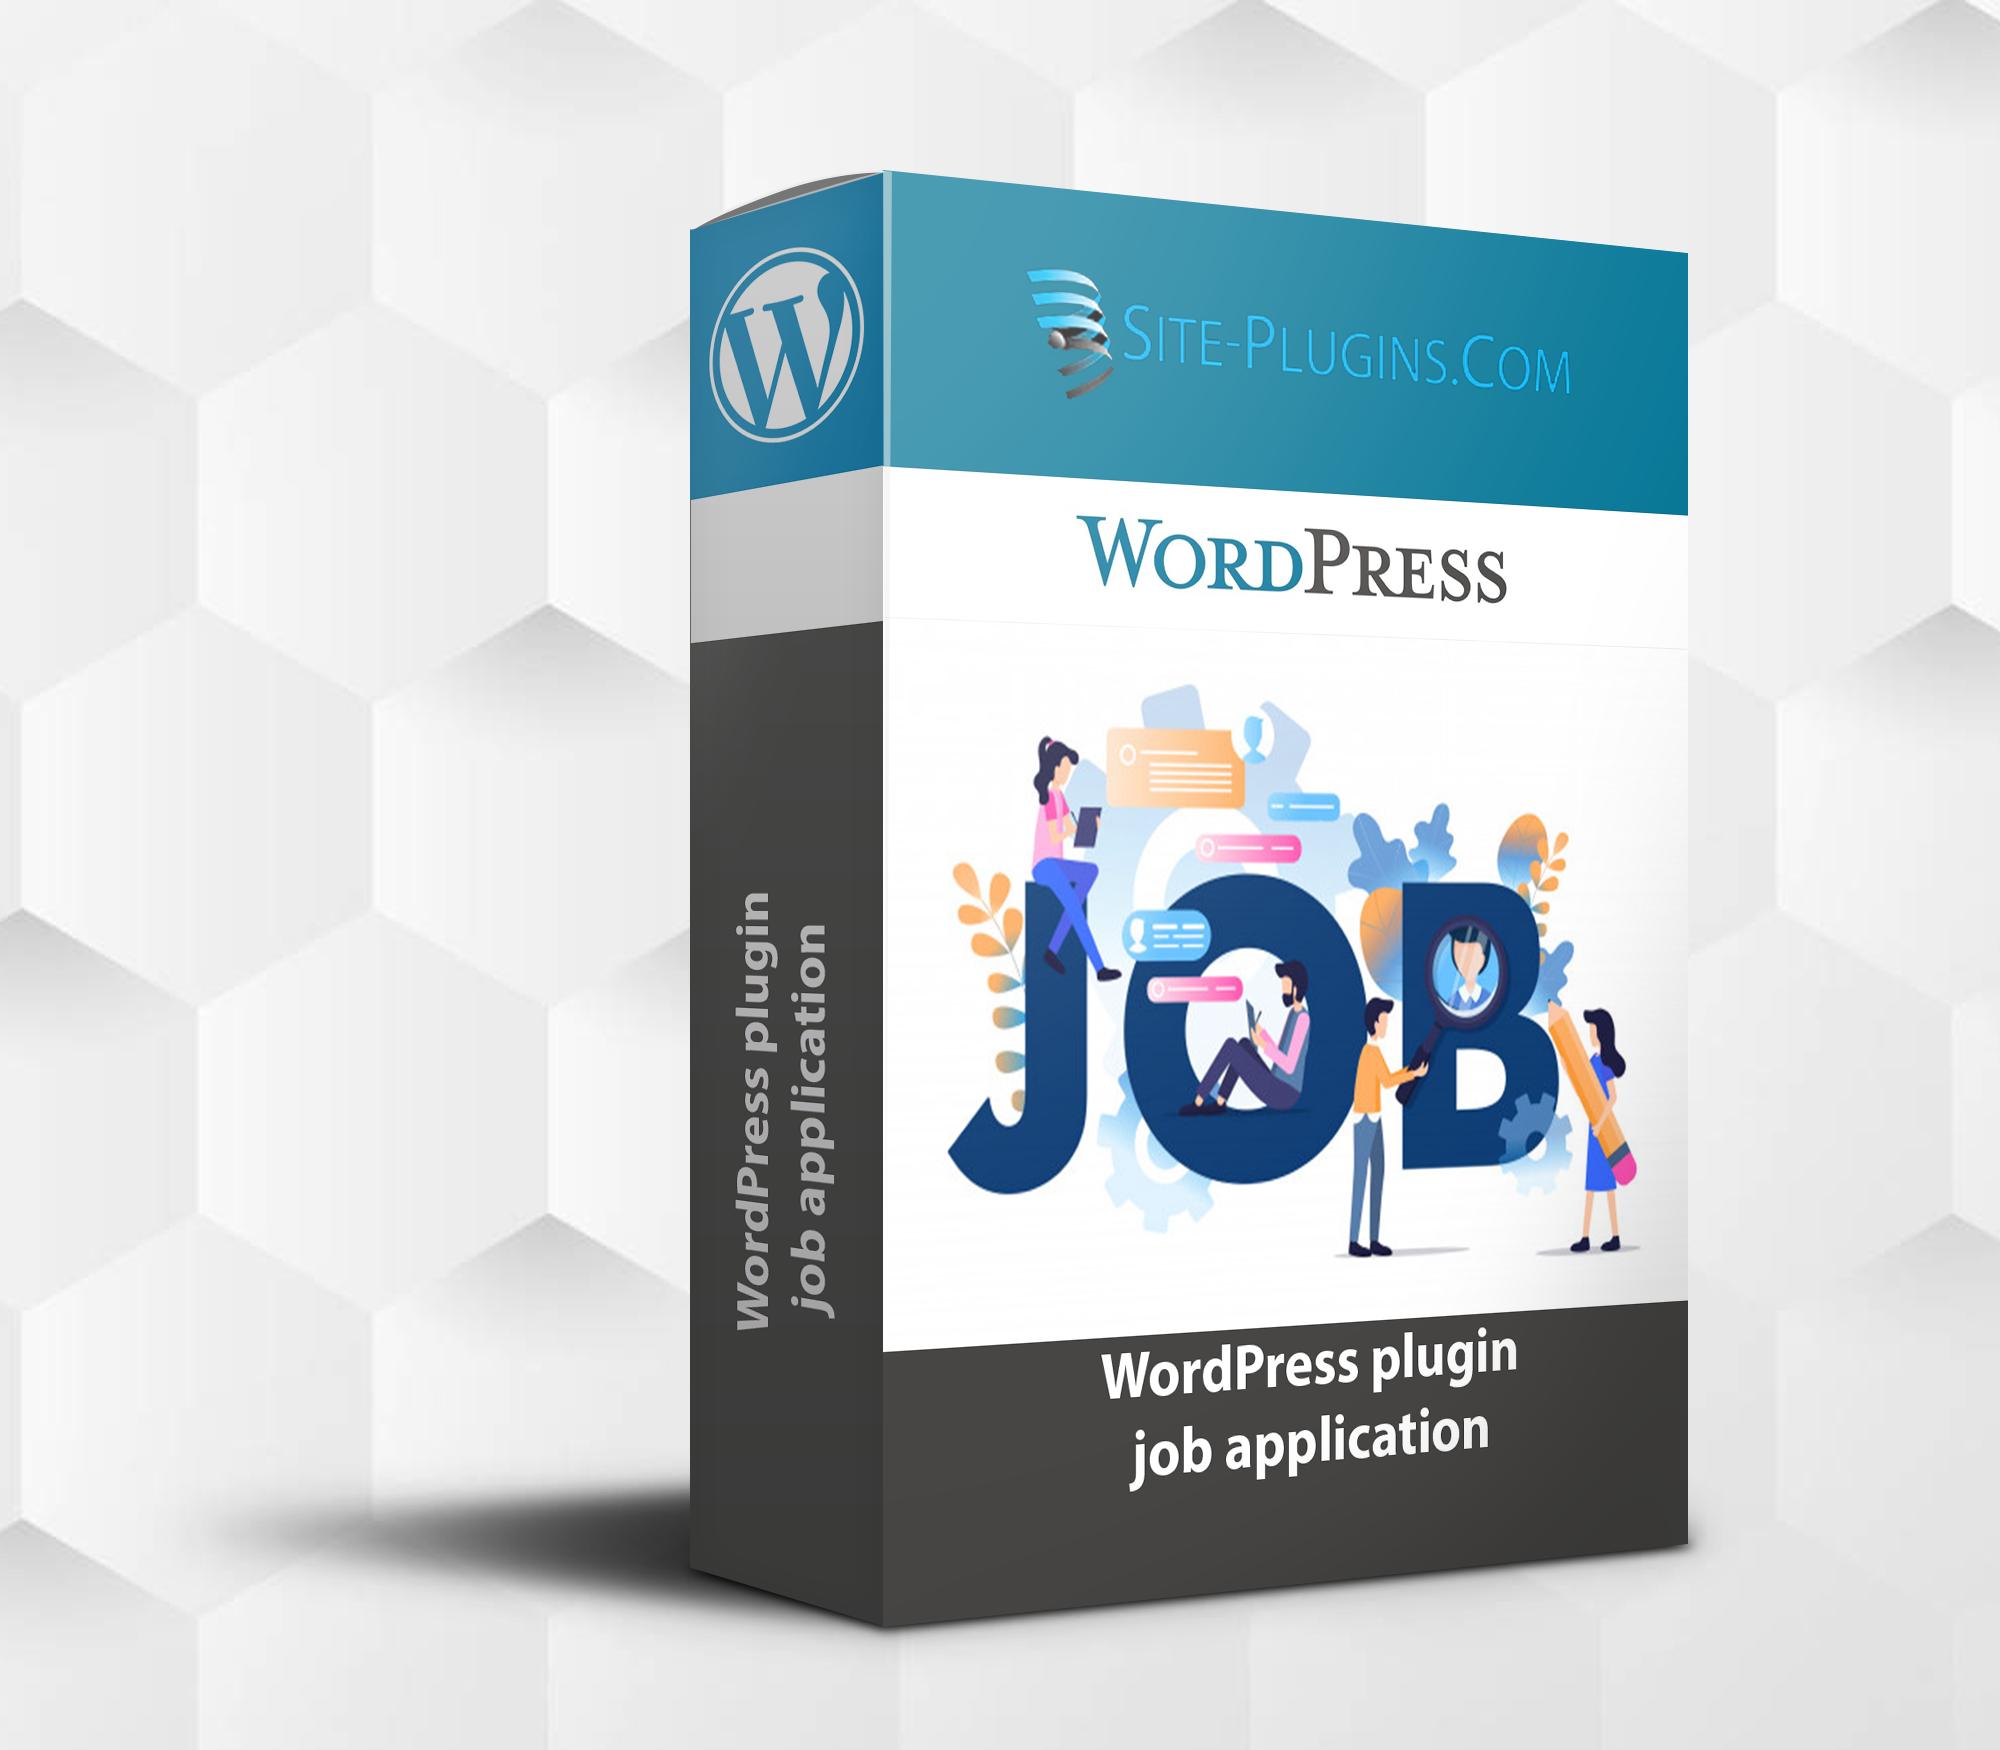 WordPress plugin job application